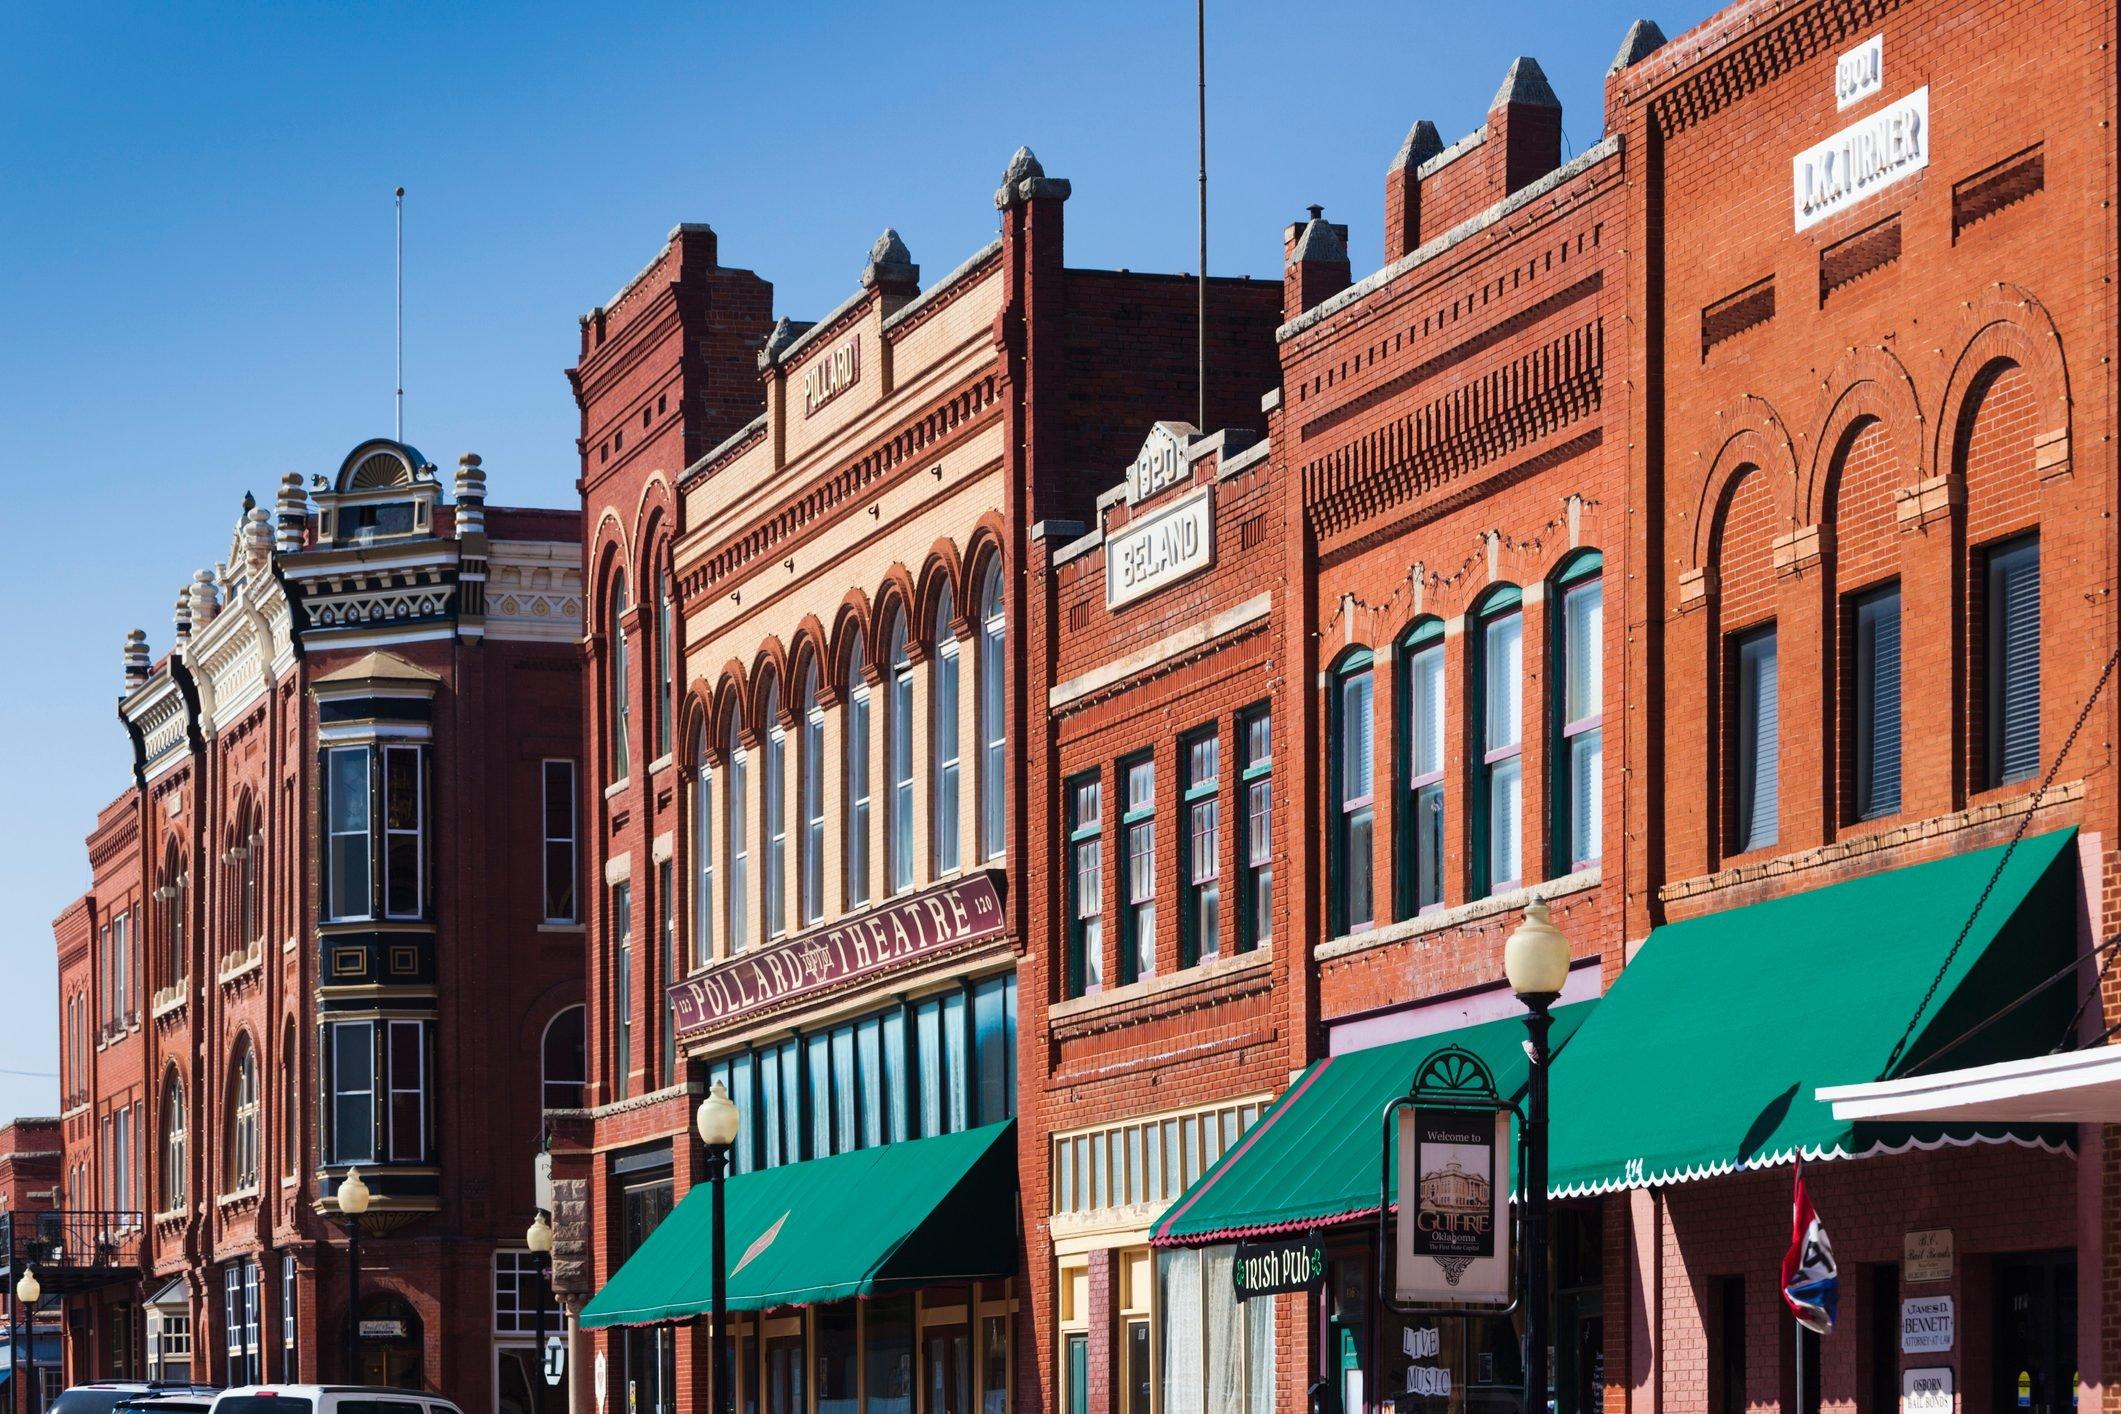 Guthrie, Oklahoma, Exterior View